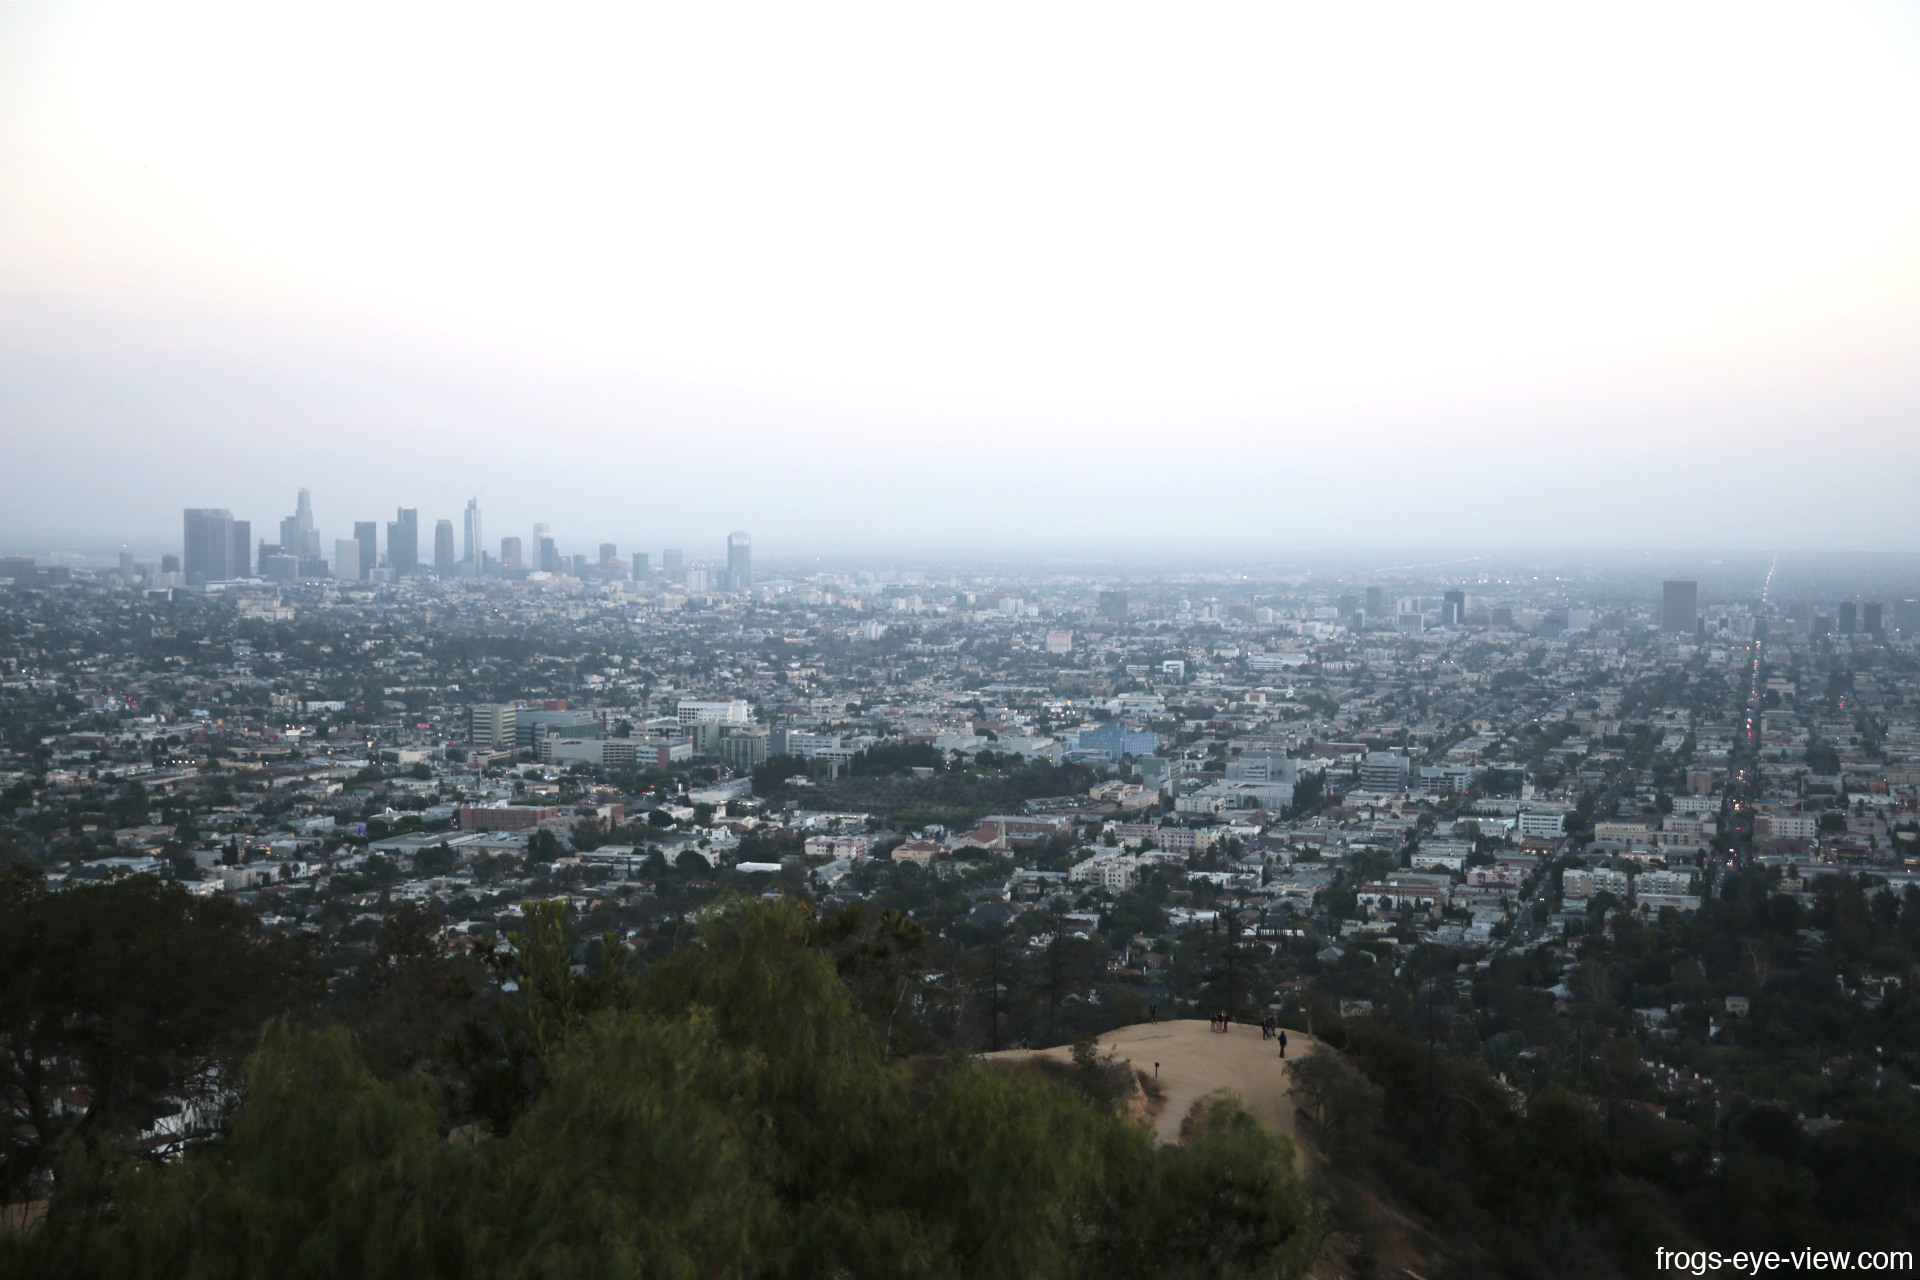 20161002_USA_Westküste_September_01_LosAngeles_Hollywood_SanDiego_JaollaBeach_MG_2015_Kopie